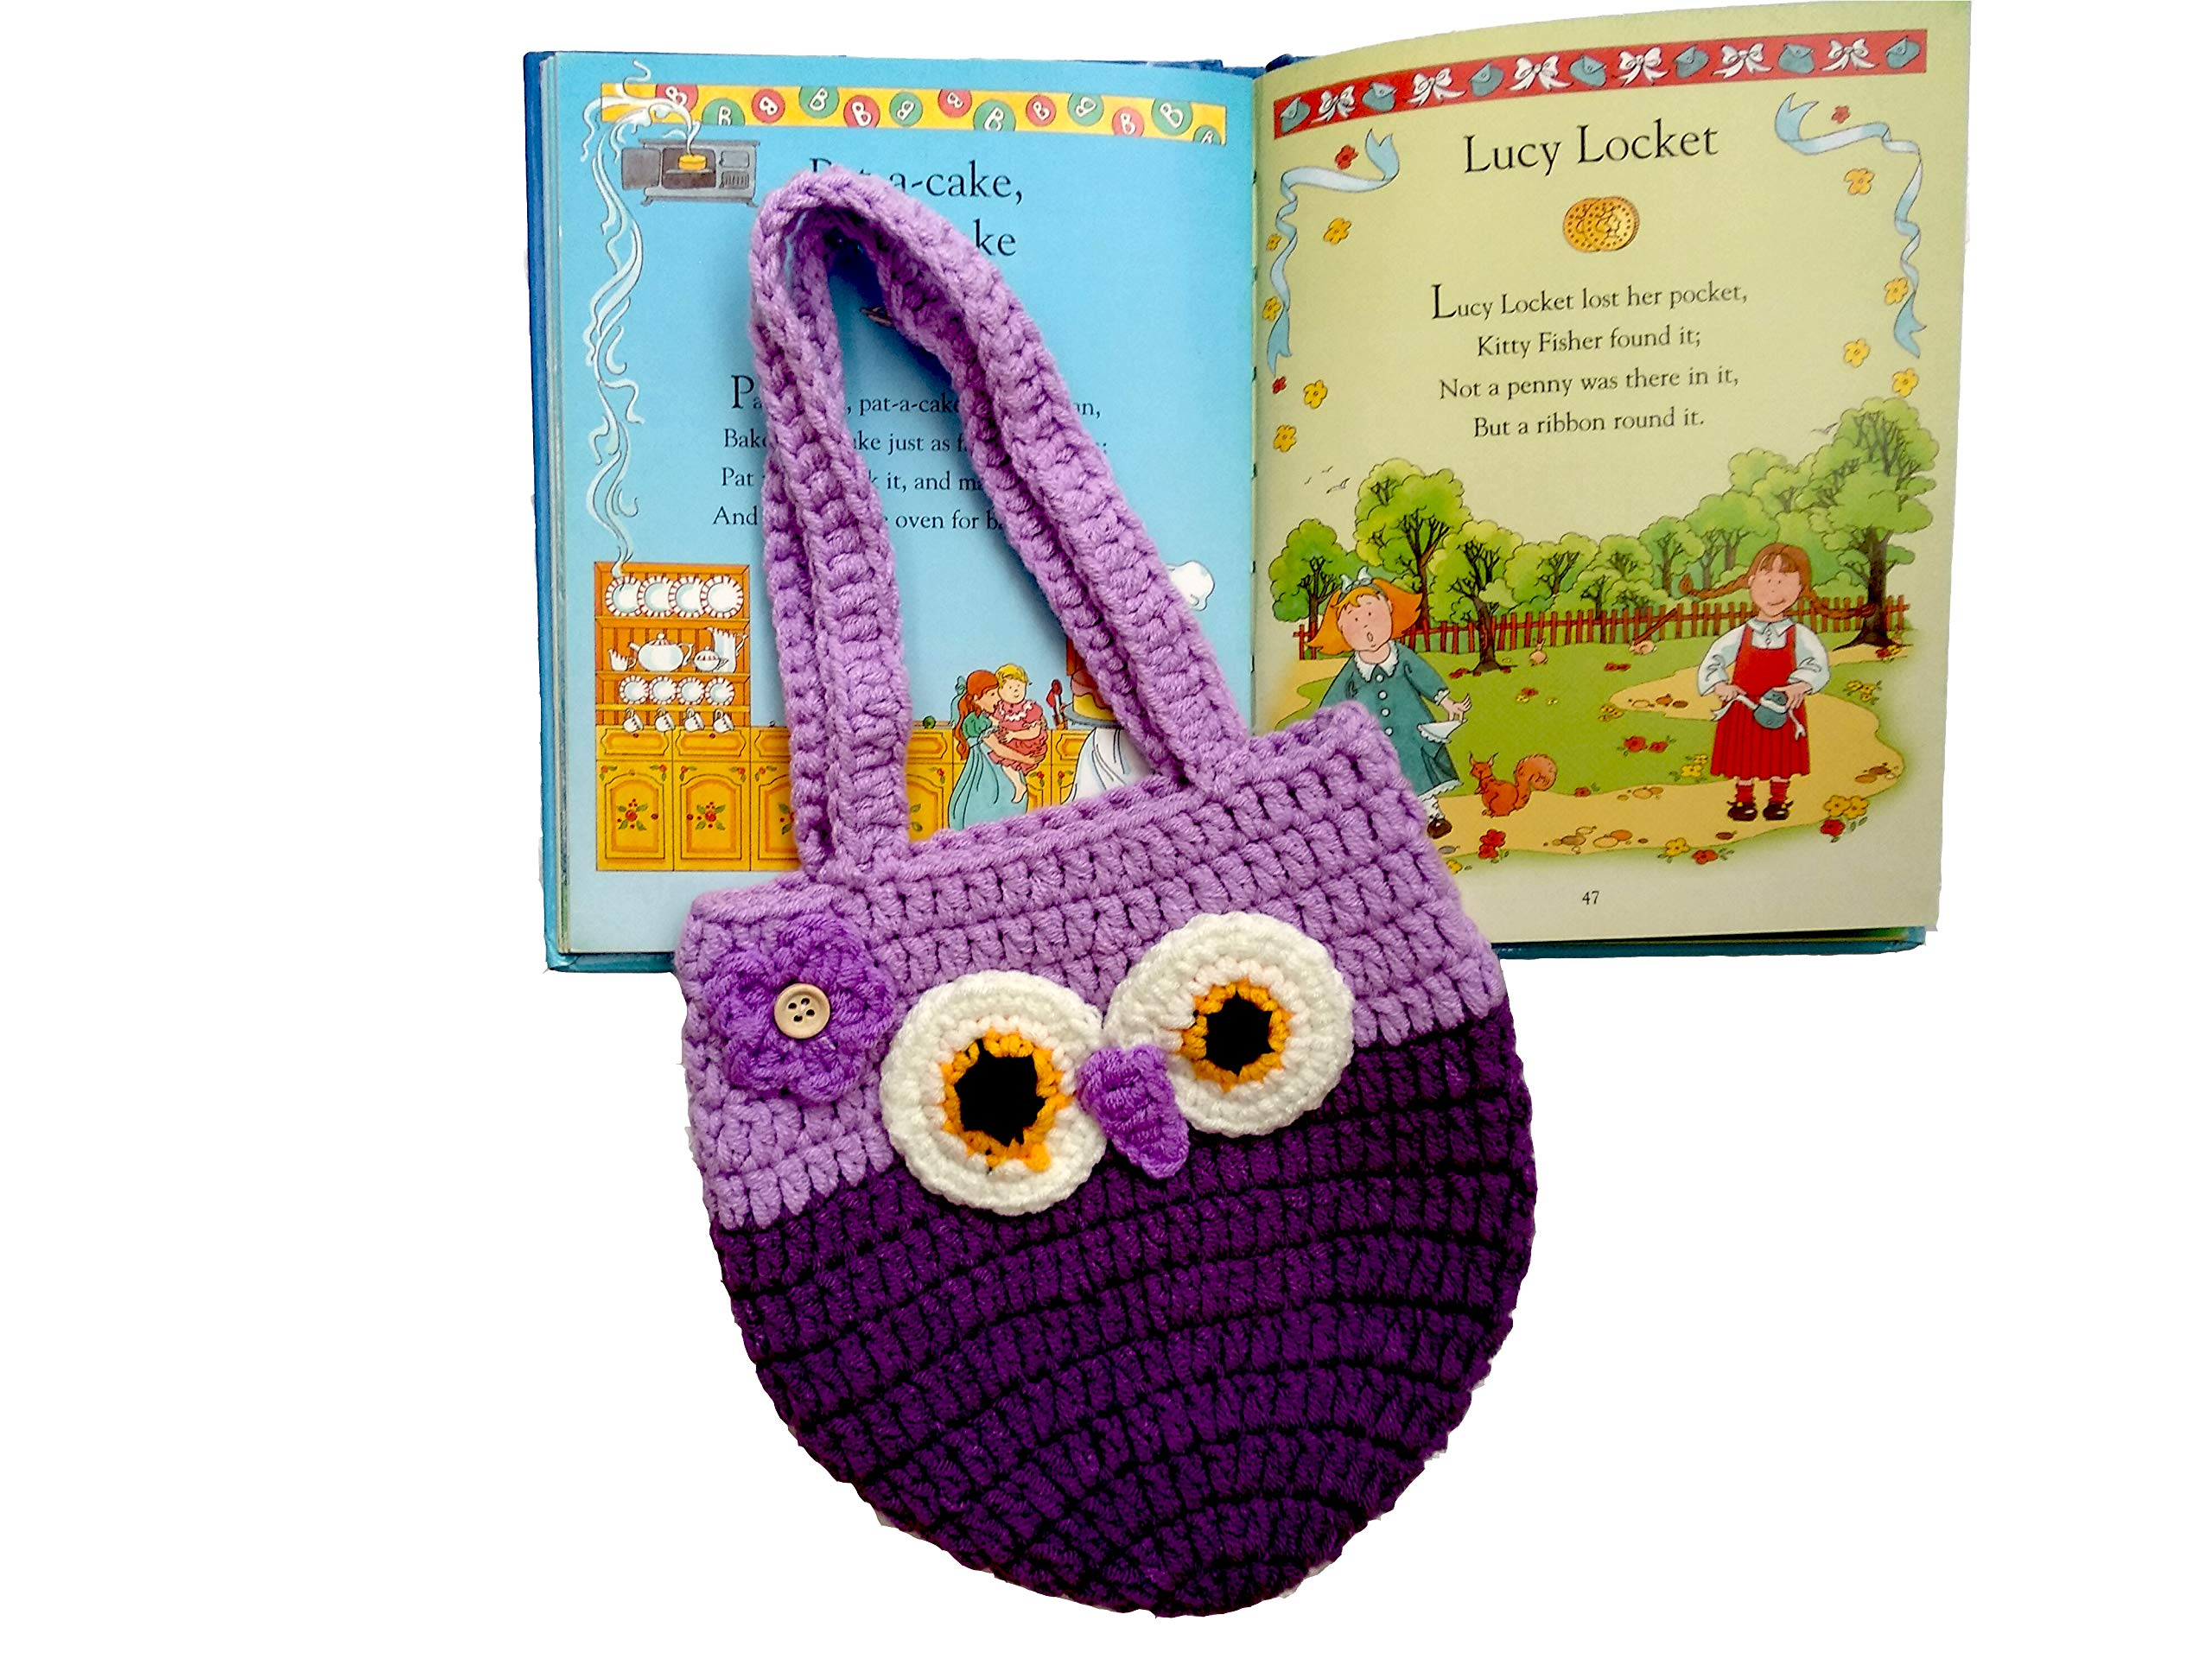 Life Space Cute Happy Owl Mini Purse / Handbag, Nature Soft Cotton/Milk Fiber, Crochet, Handmade - Great Special Present for 2,3,4,5,6 Year Preschool Girls (purple) by Life Space (Image #2)